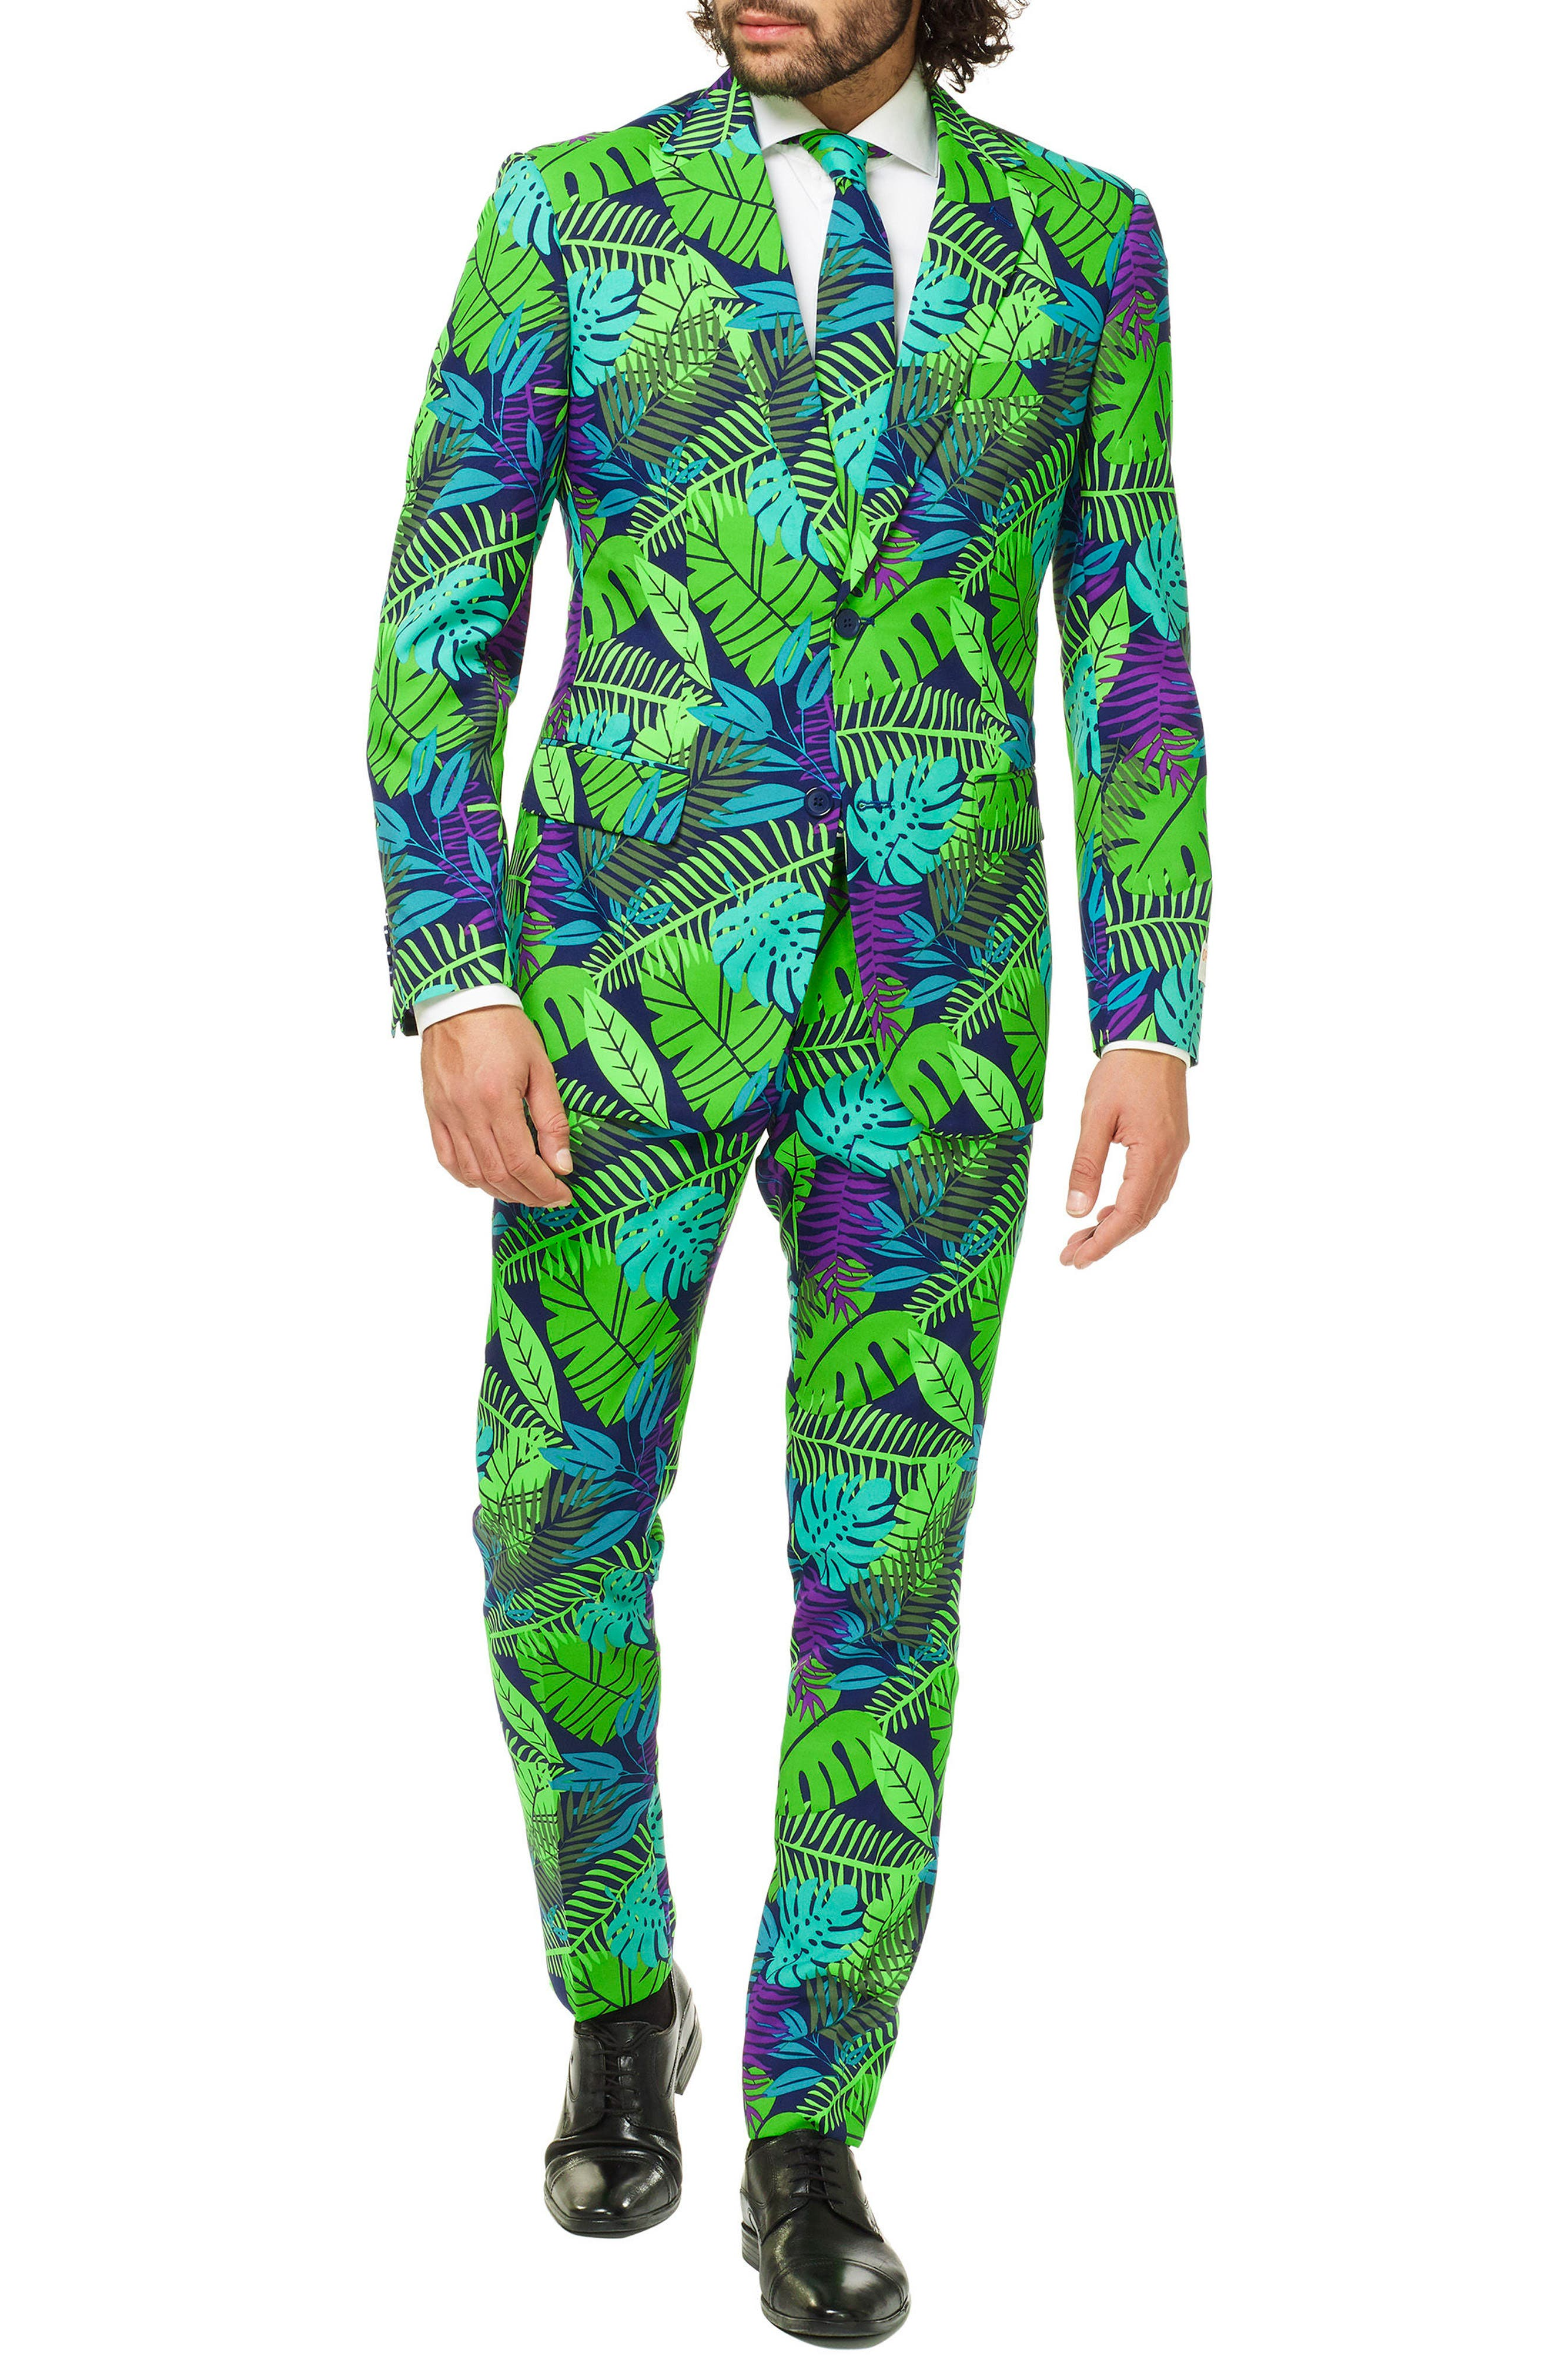 Juicy Jungle Trim Fit two-Piece Suit with Tie,                         Main,                         color, MISCELLANEOUS